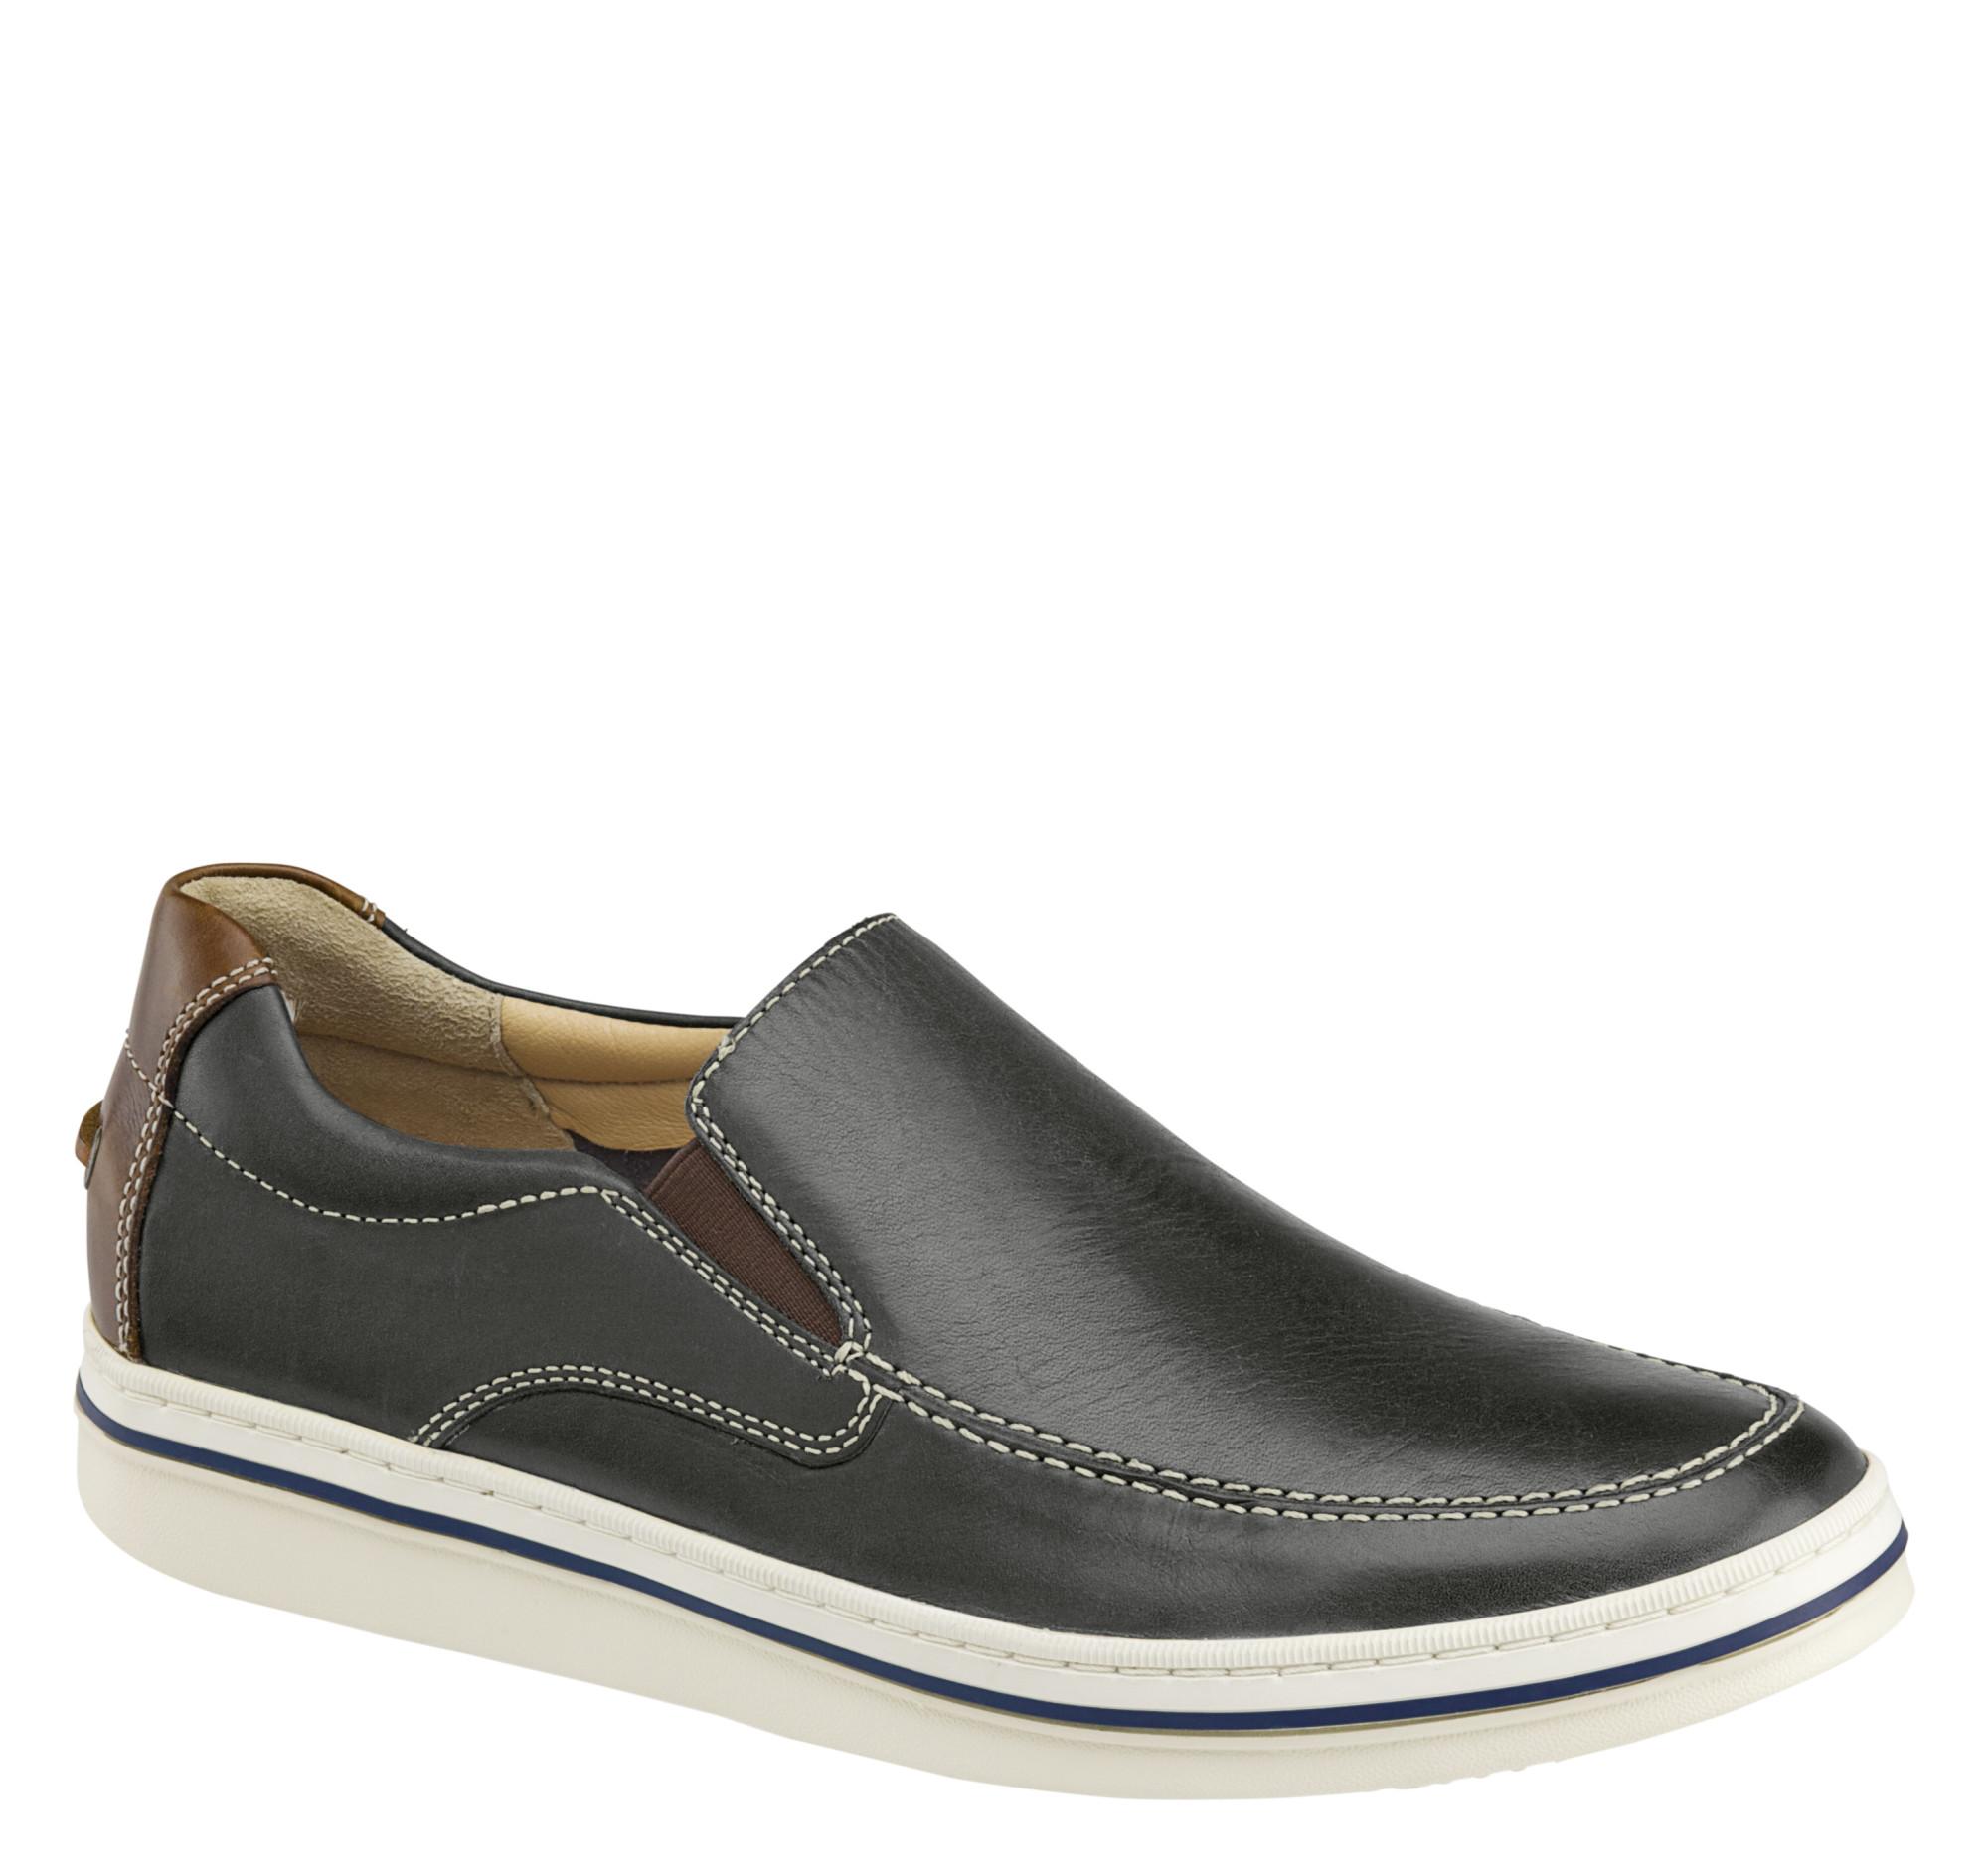 Bowling Moc Venetian Johnston Murphy D Island Shoes Slip On Mocasine Casual Loafers Black Magiczoom Window